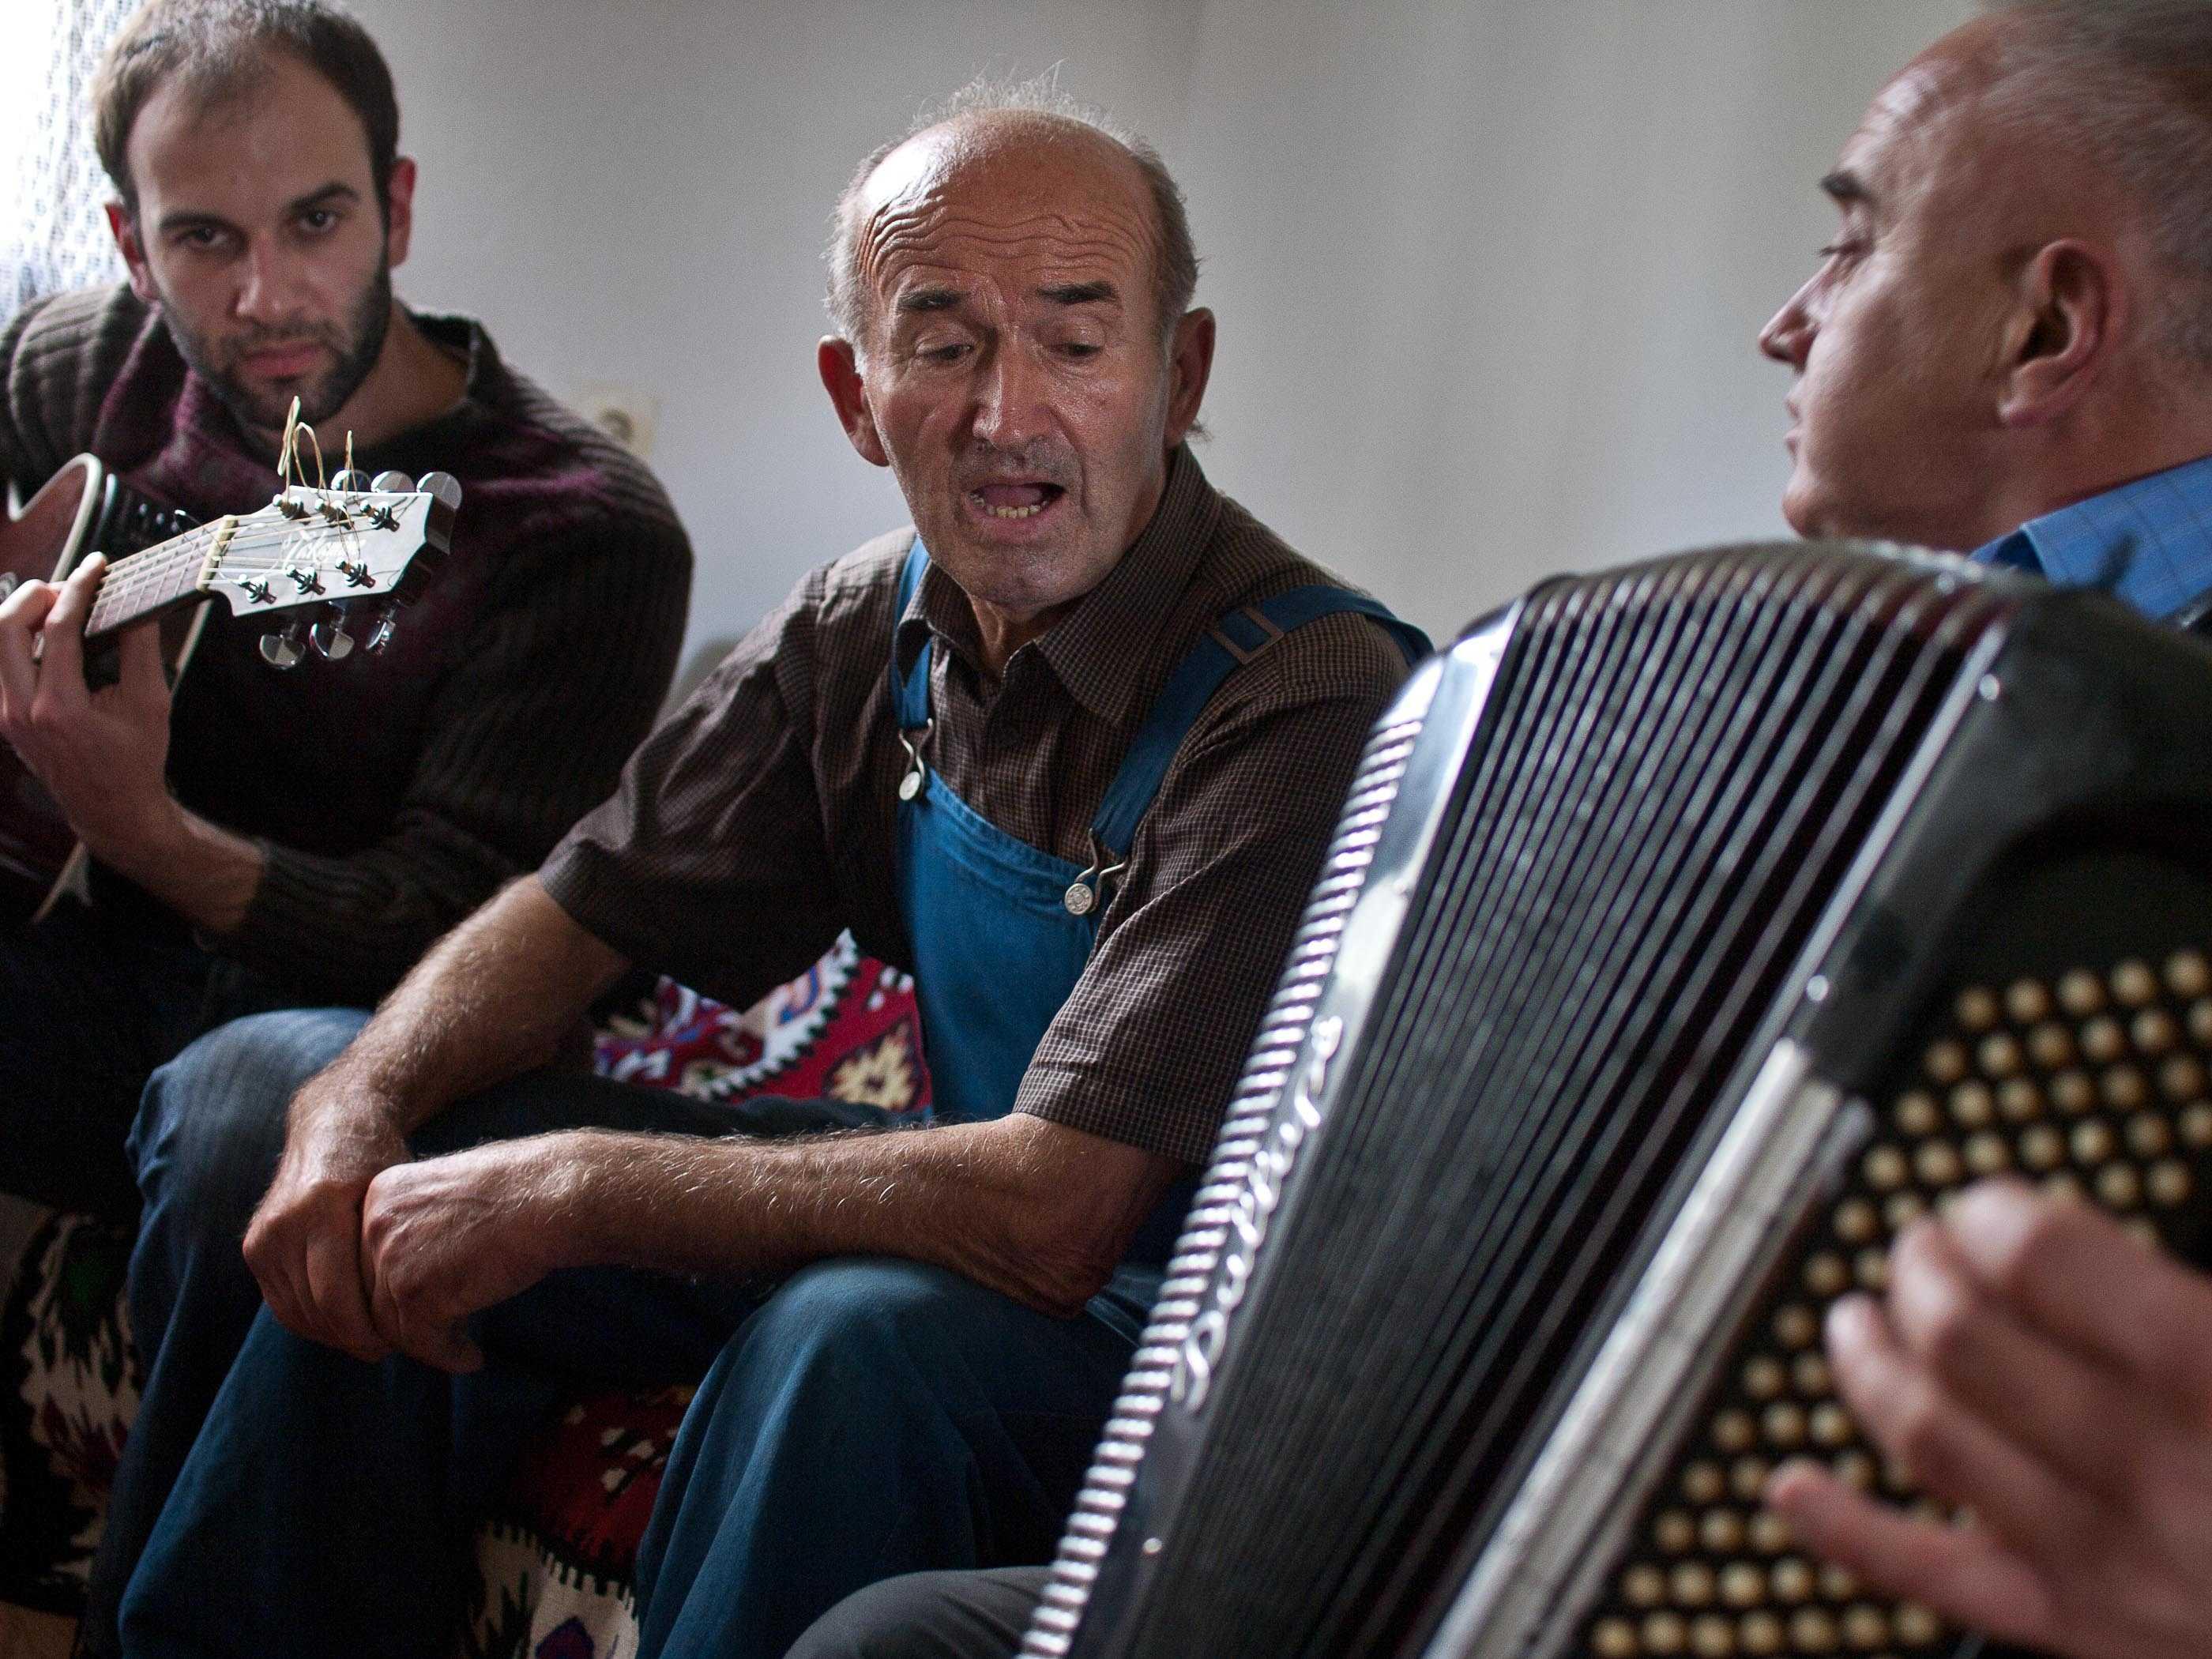 Three generations of Serbian musicians